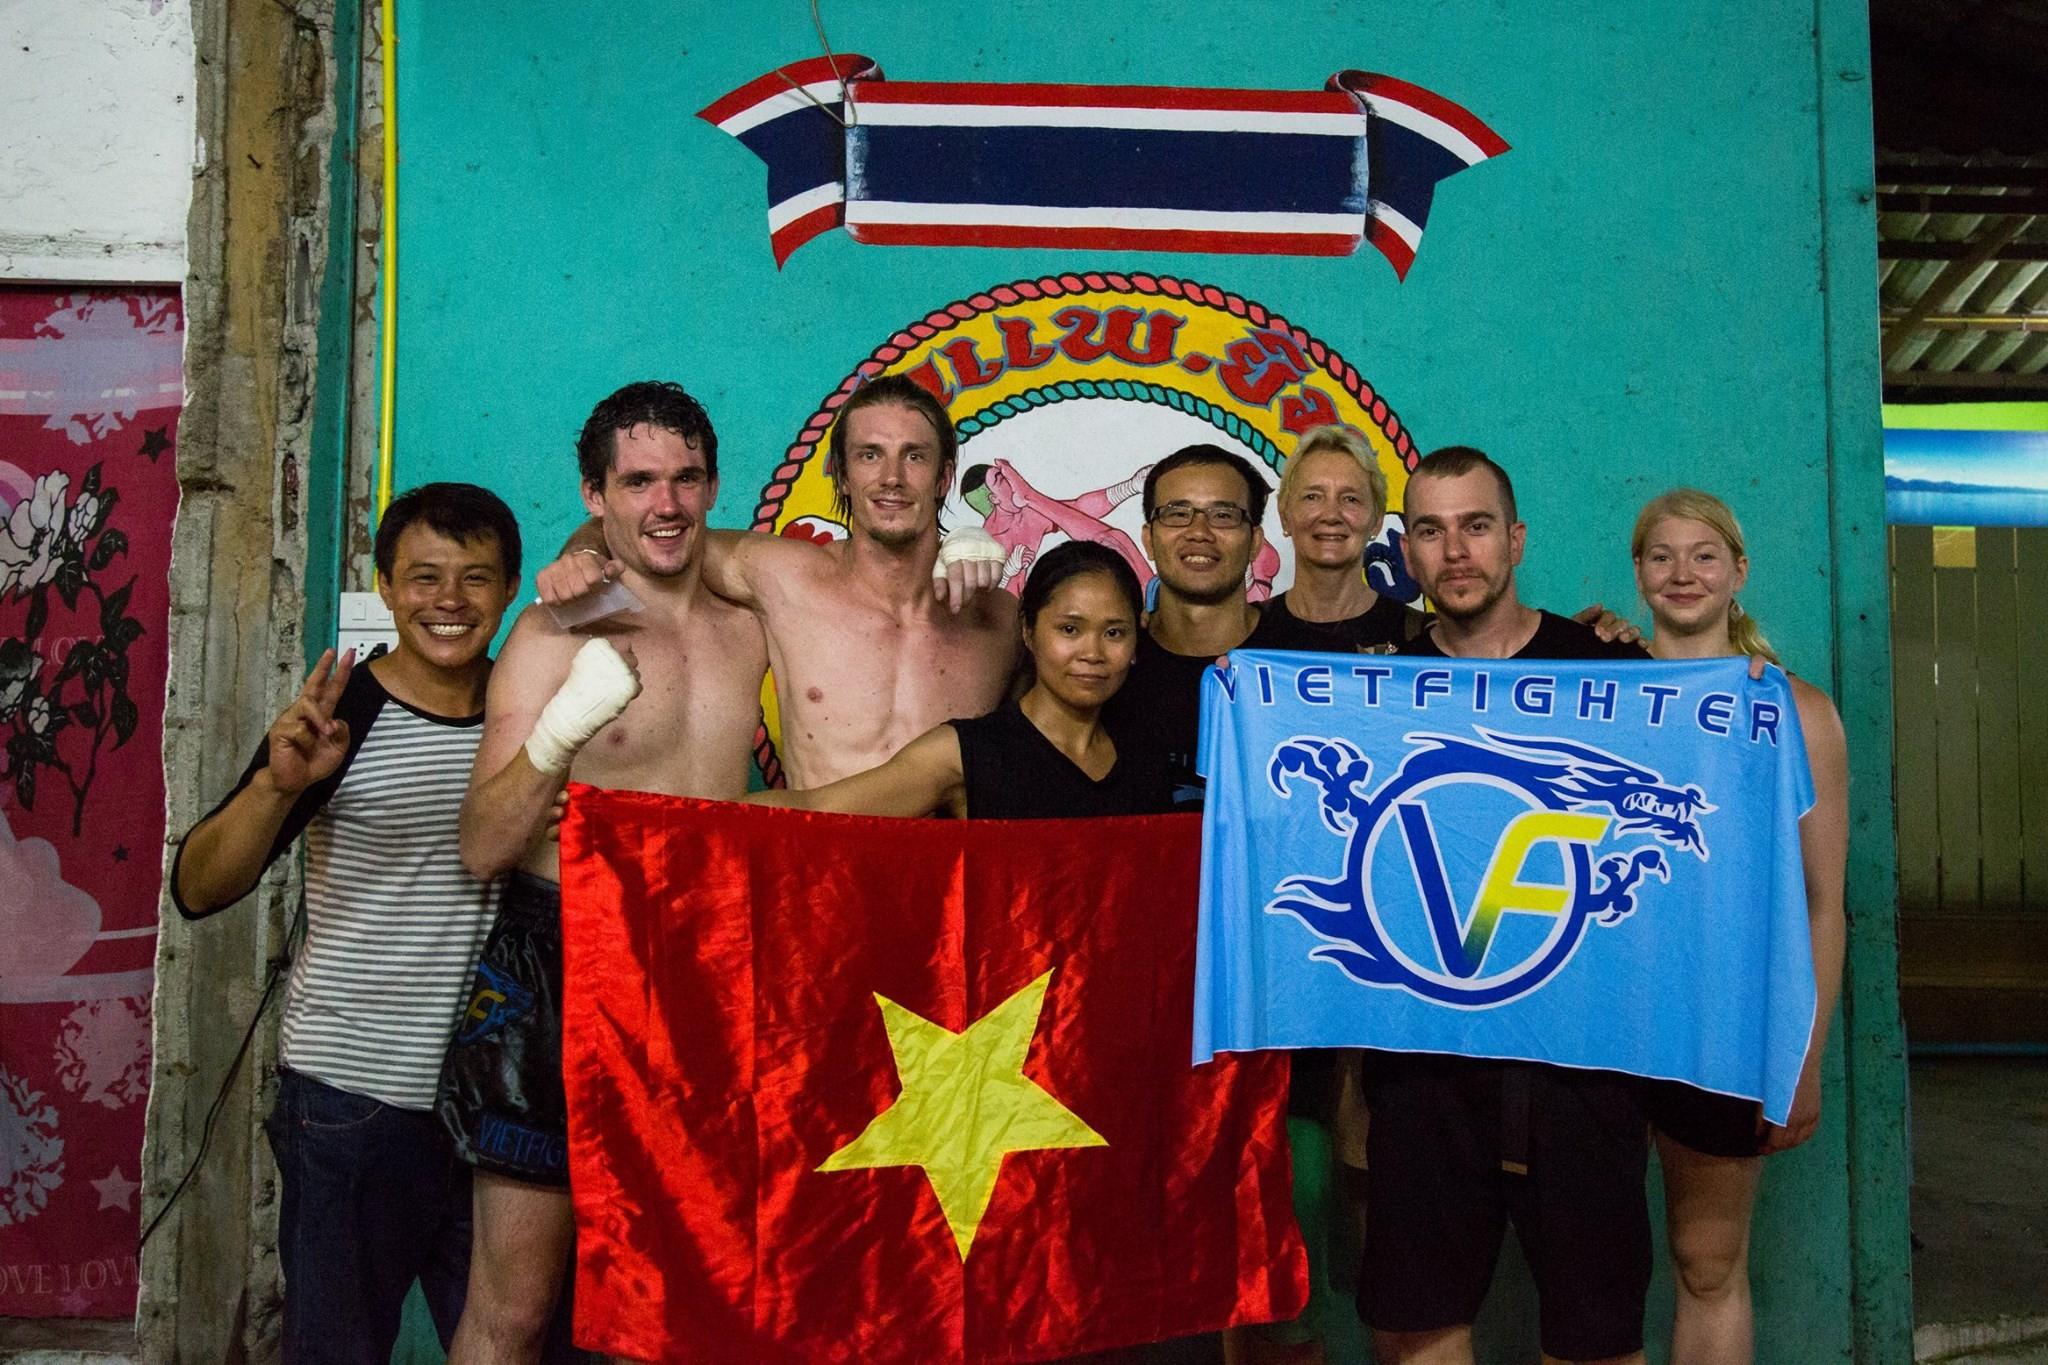 Vietfighter Gym